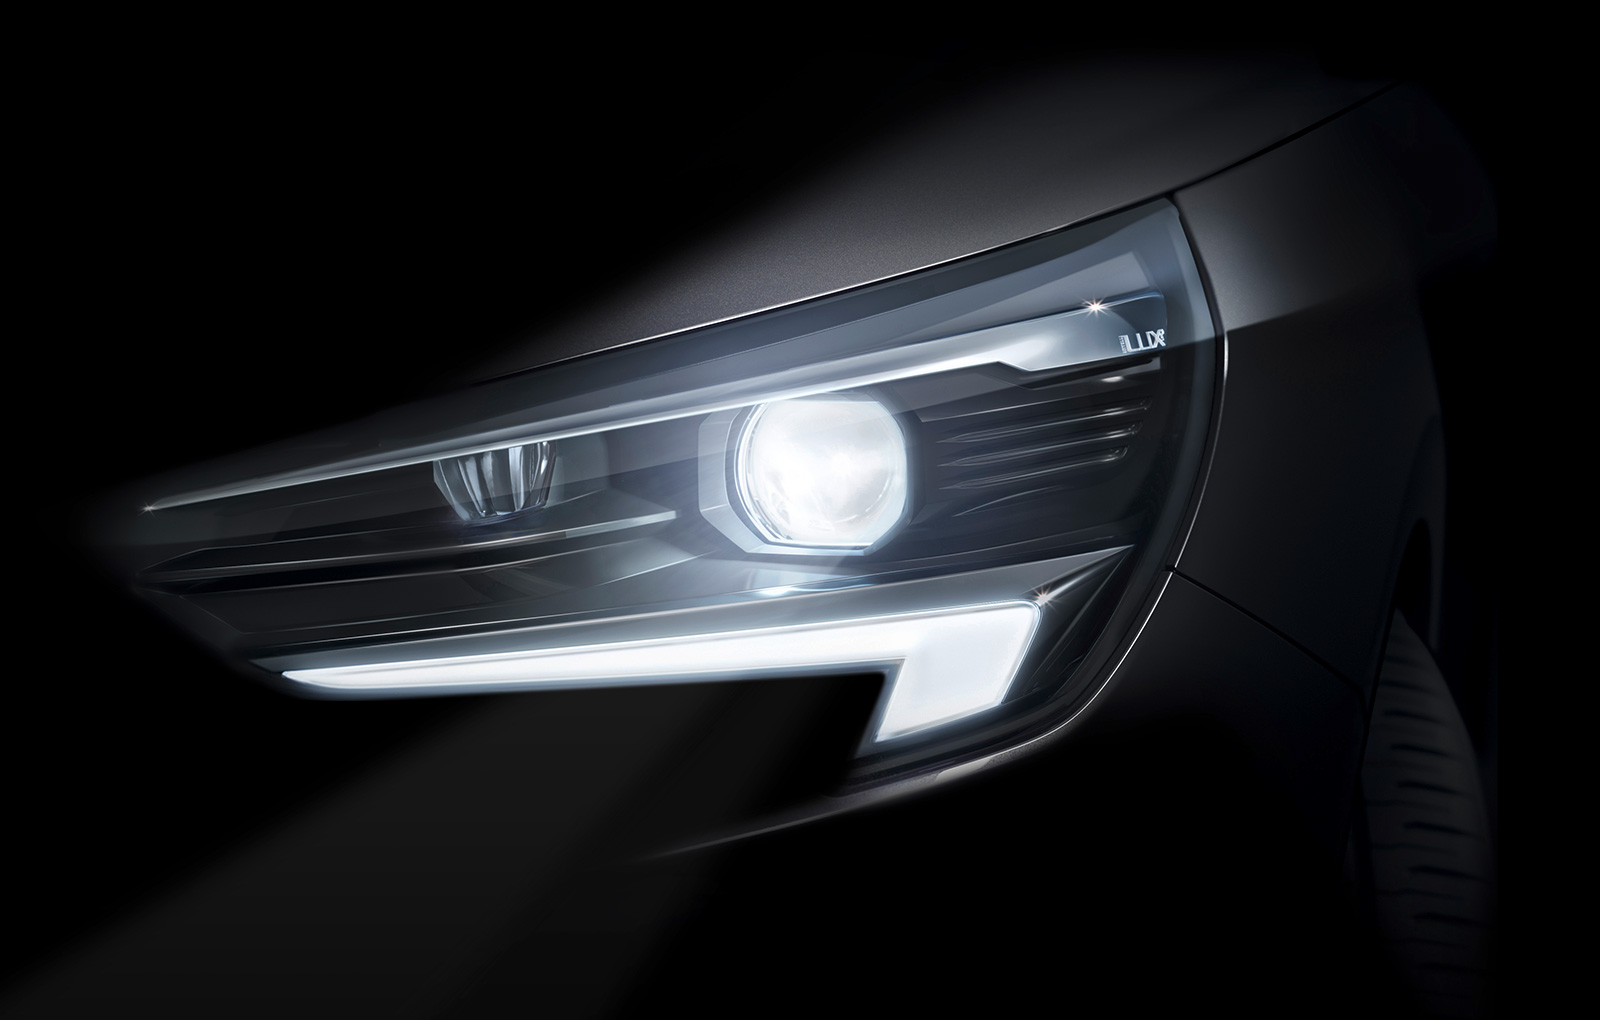 Opel Corsa F dobija novu platformu i IntelliLux farove